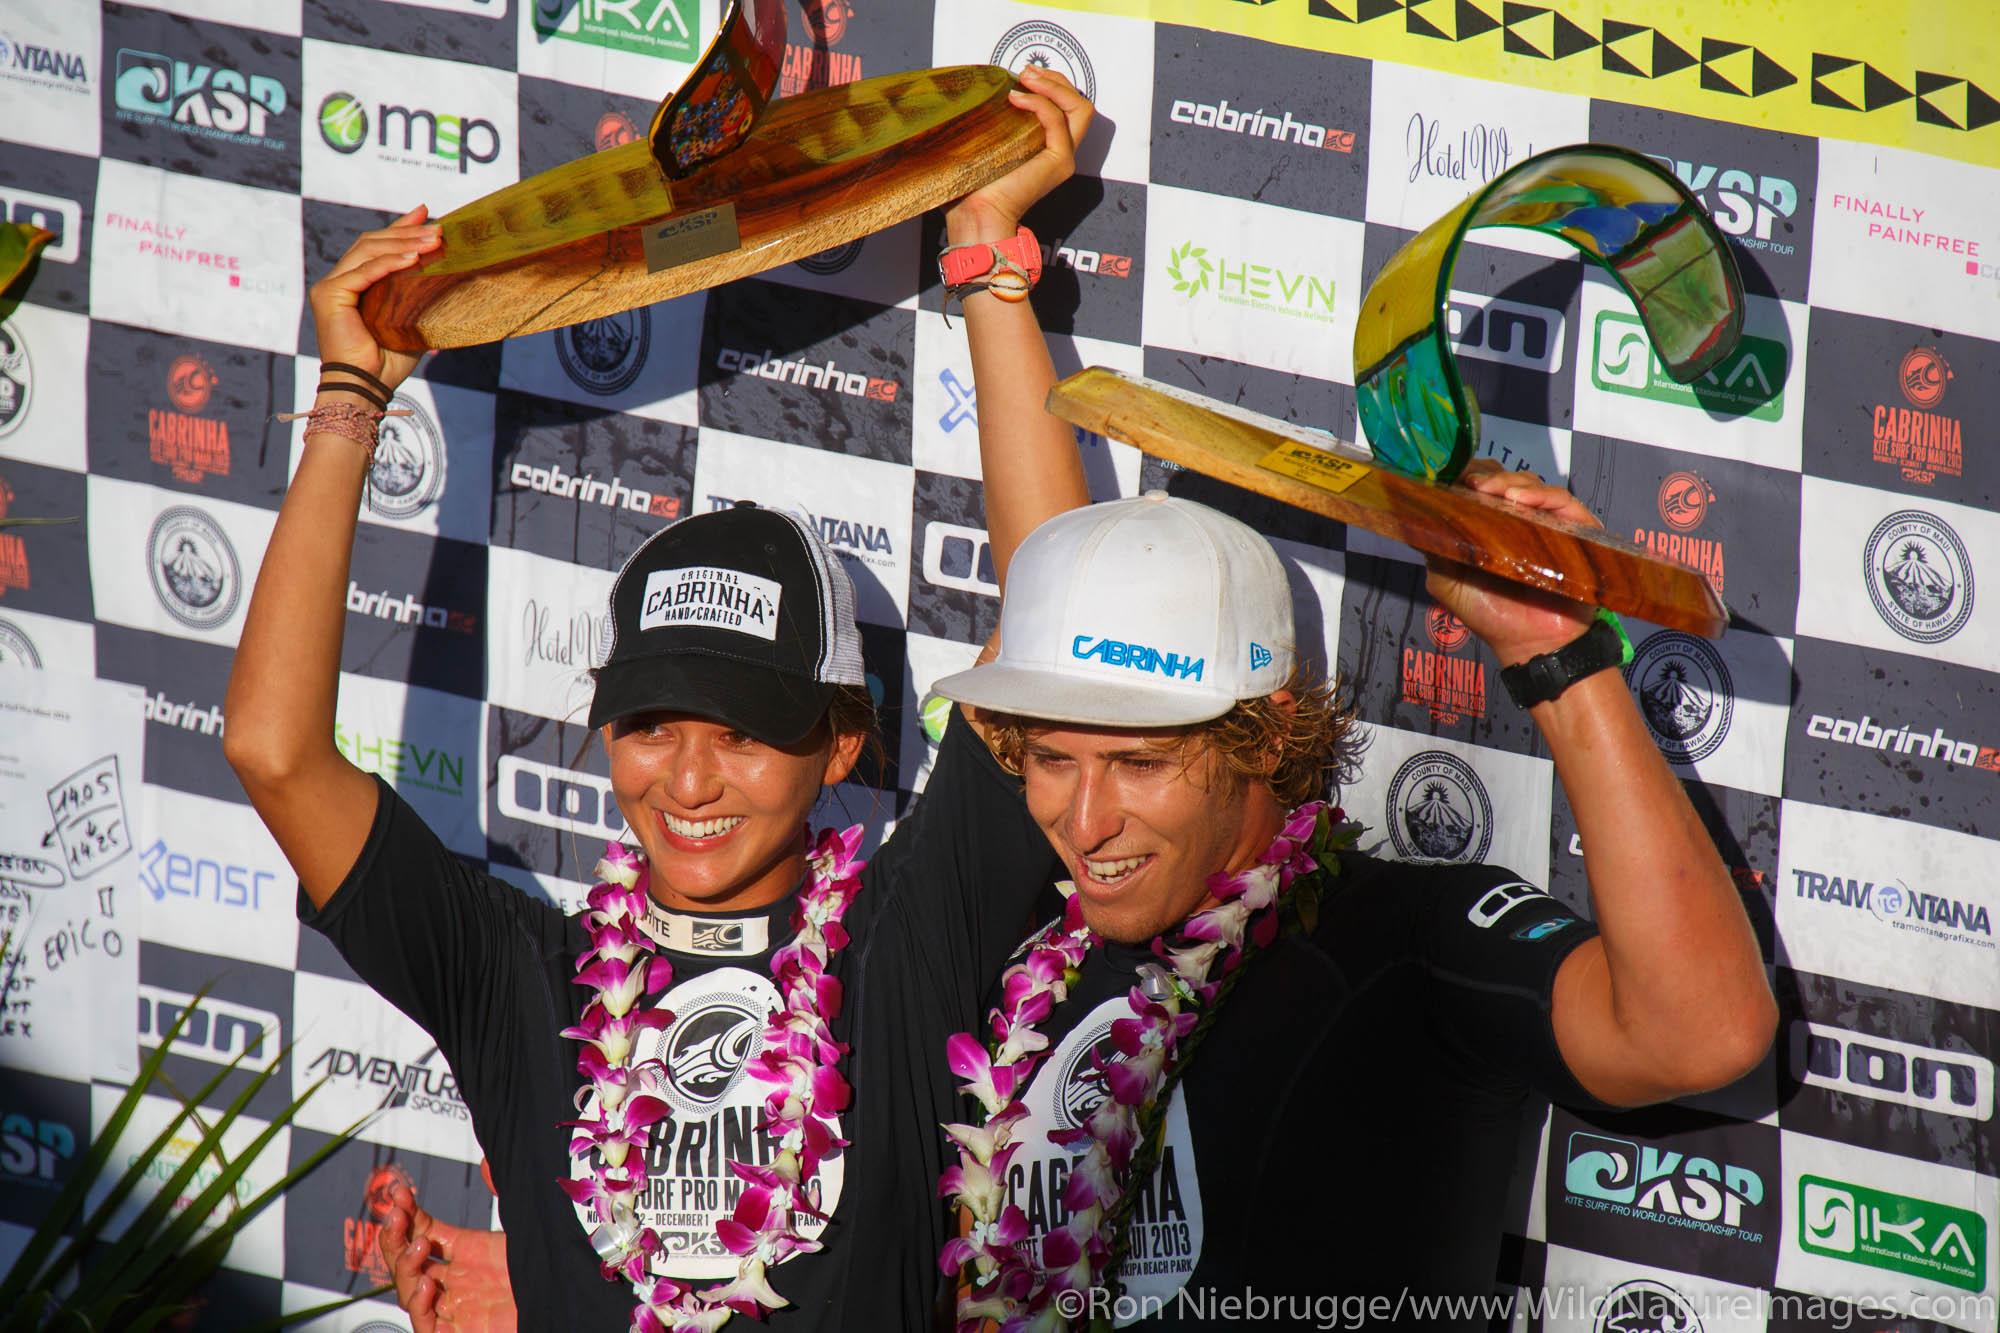 2013 World Champions. Moona Whyte (from Hawaii) and Keahi DeAboitiz (Australia) at the 2013 Kite Surf Pro World Championships...